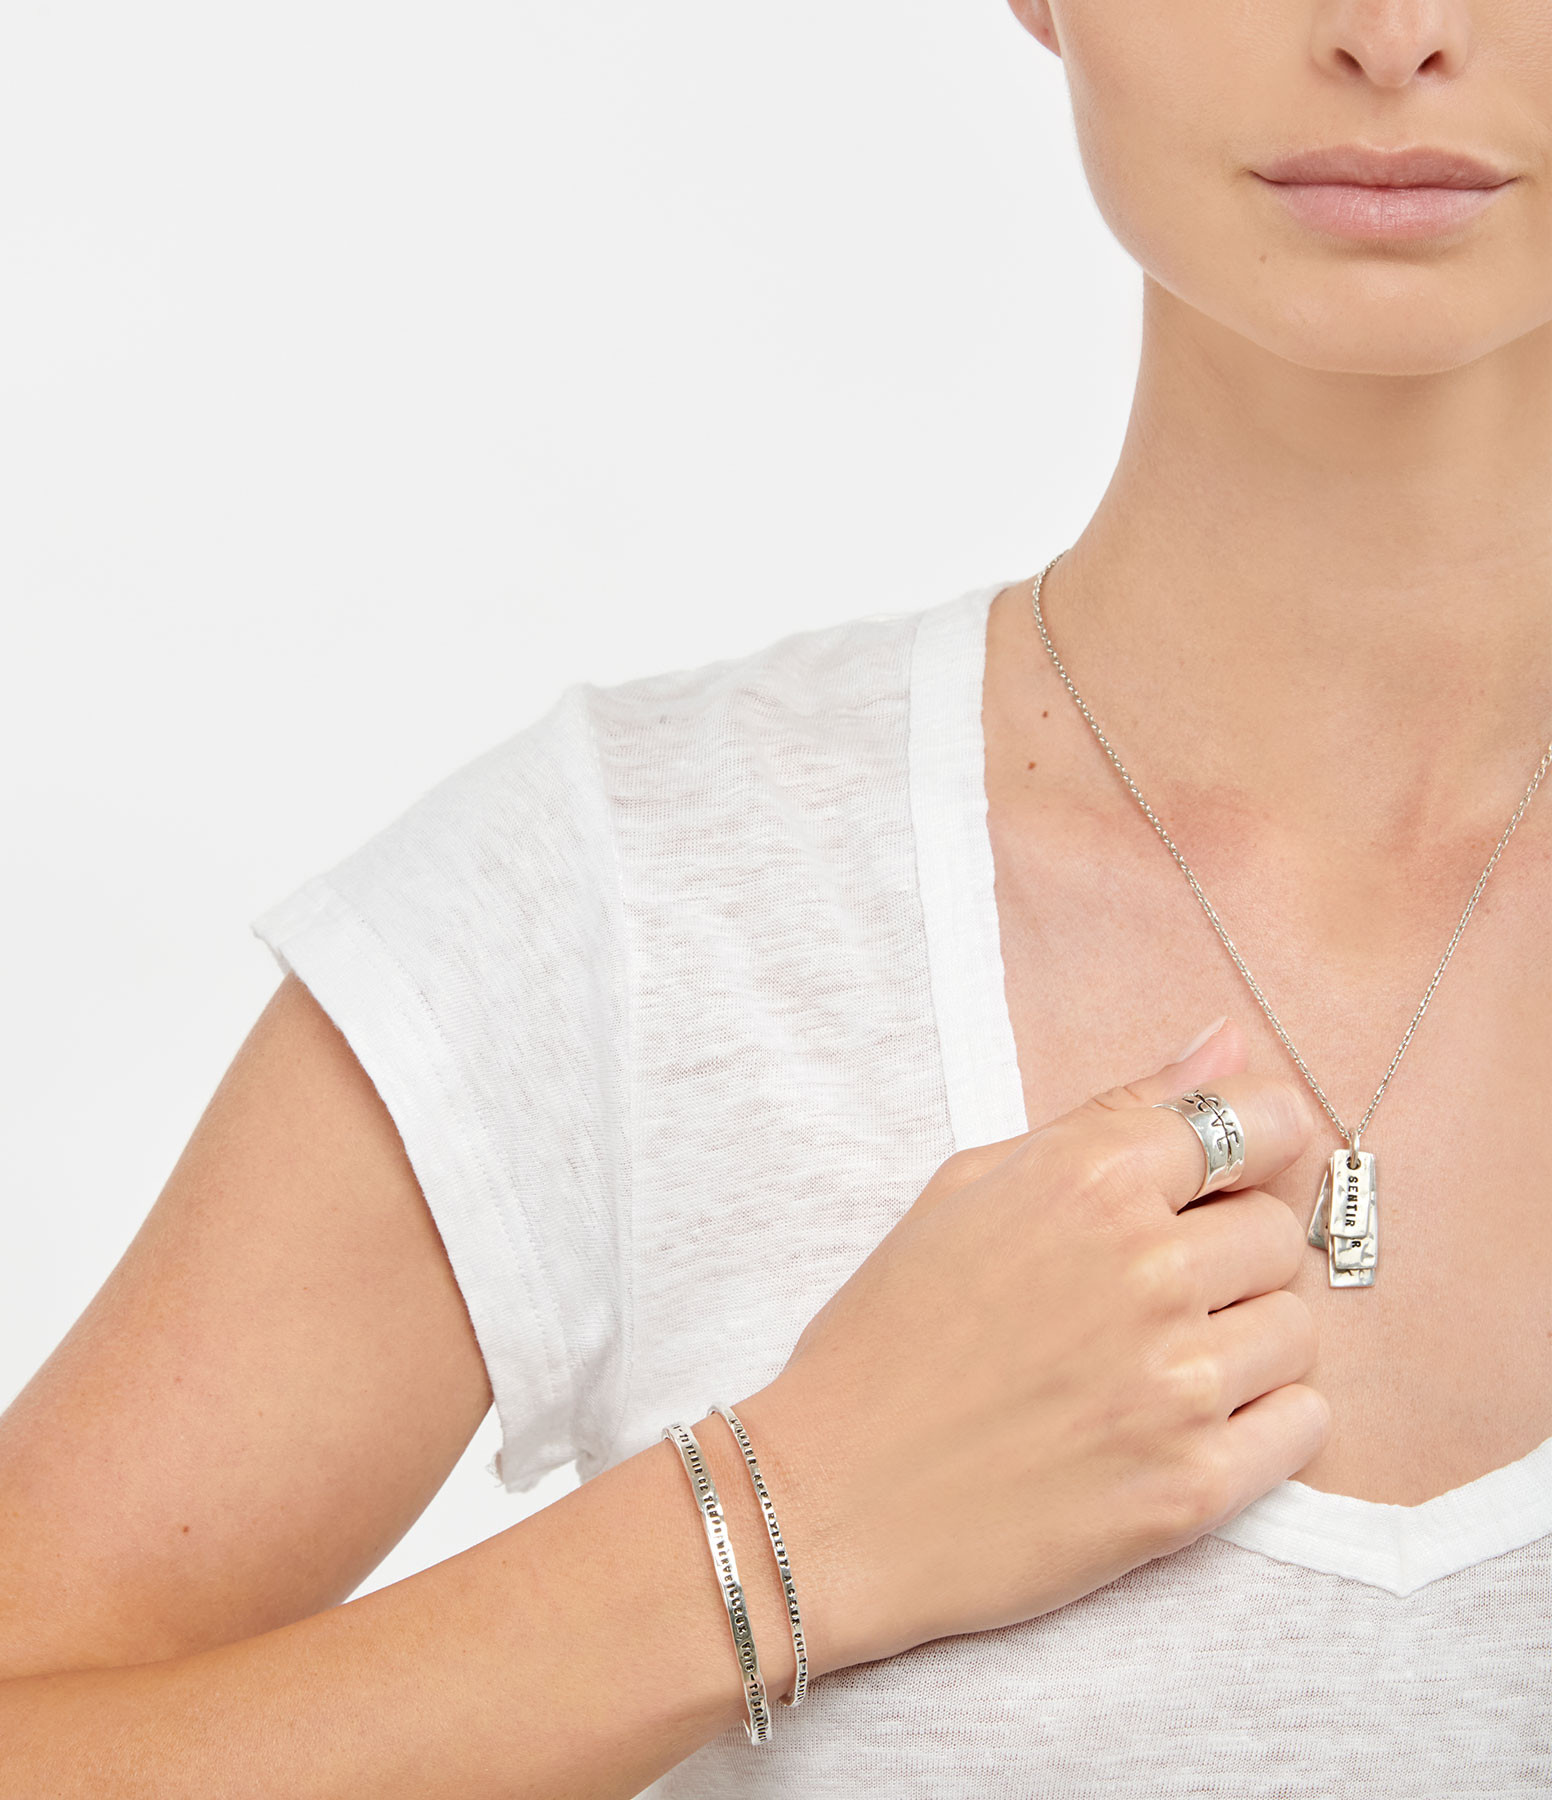 SERGE THORAVAL - Bracelet Bonheur Argent